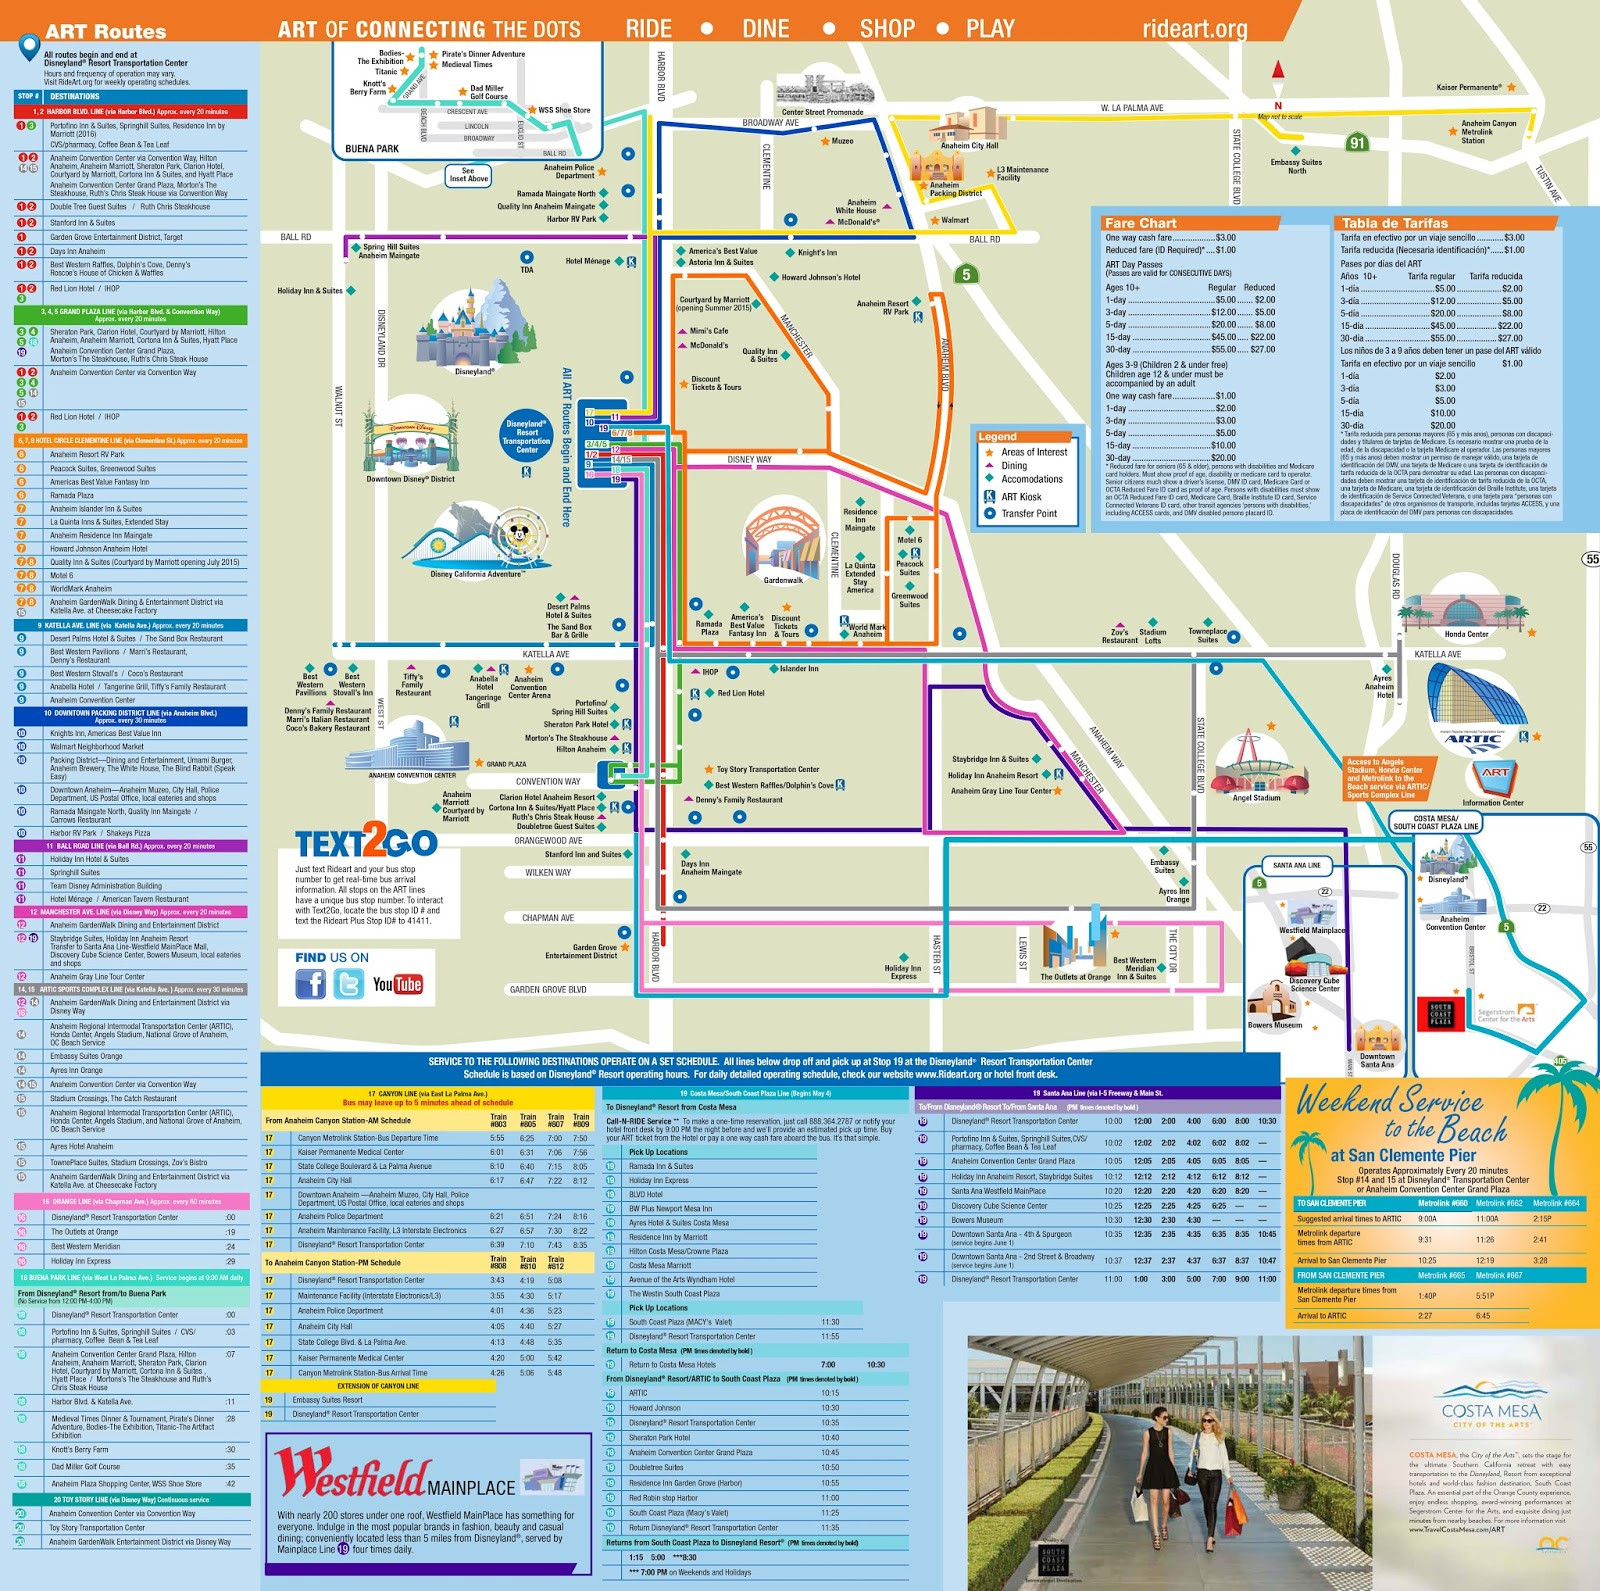 Downtown Disney Map California New Map Around Disneyland - Map Of Hotels Around Disneyland California